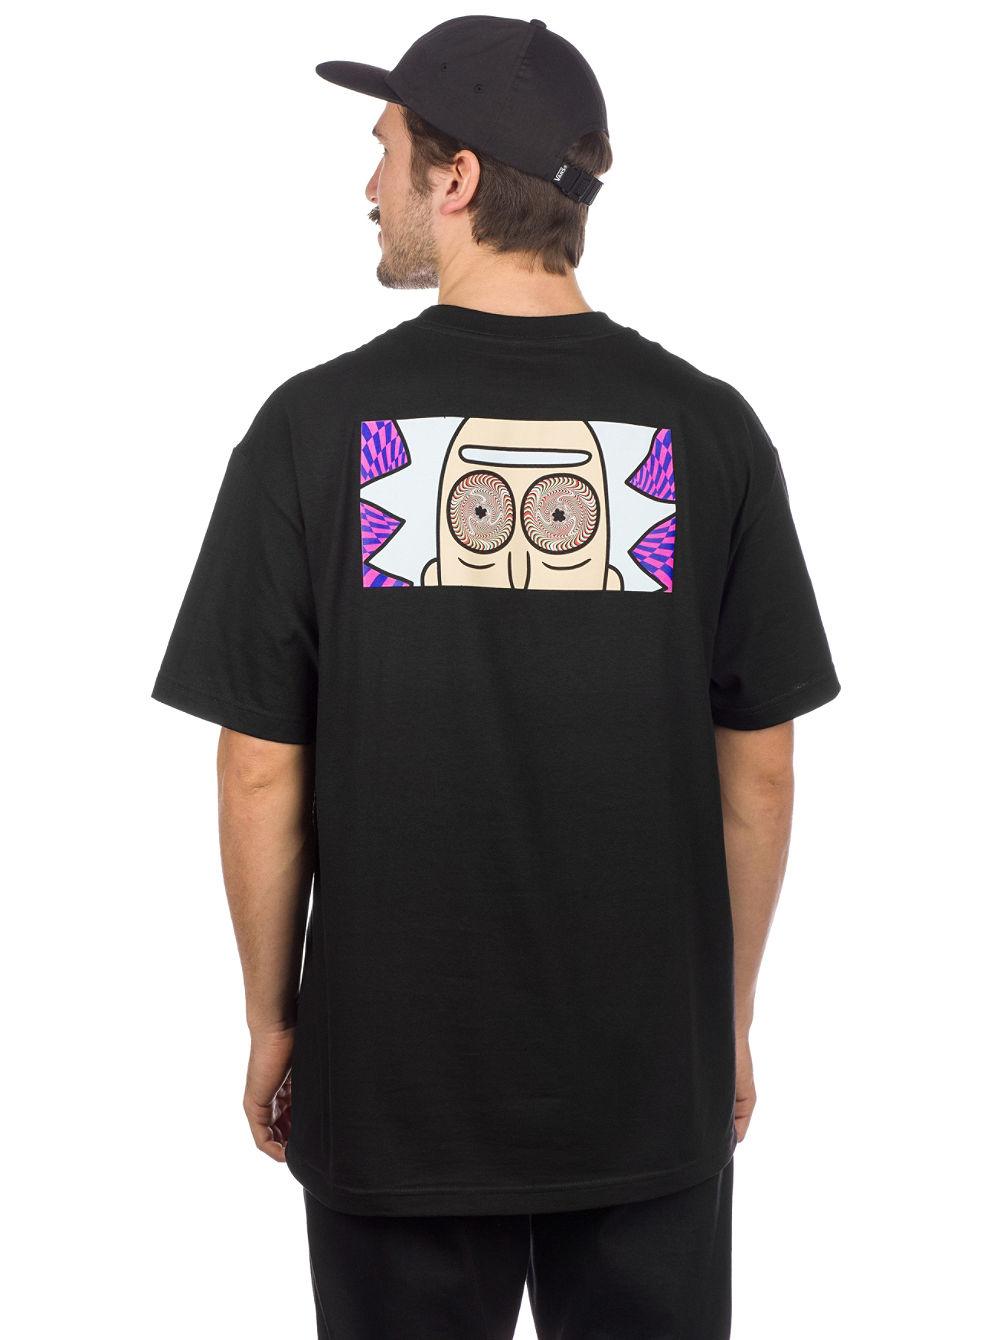 05fdfab3 Buy Primitive Rick & Morty Hypno Eyes T-Shirt online at Blue Tomato